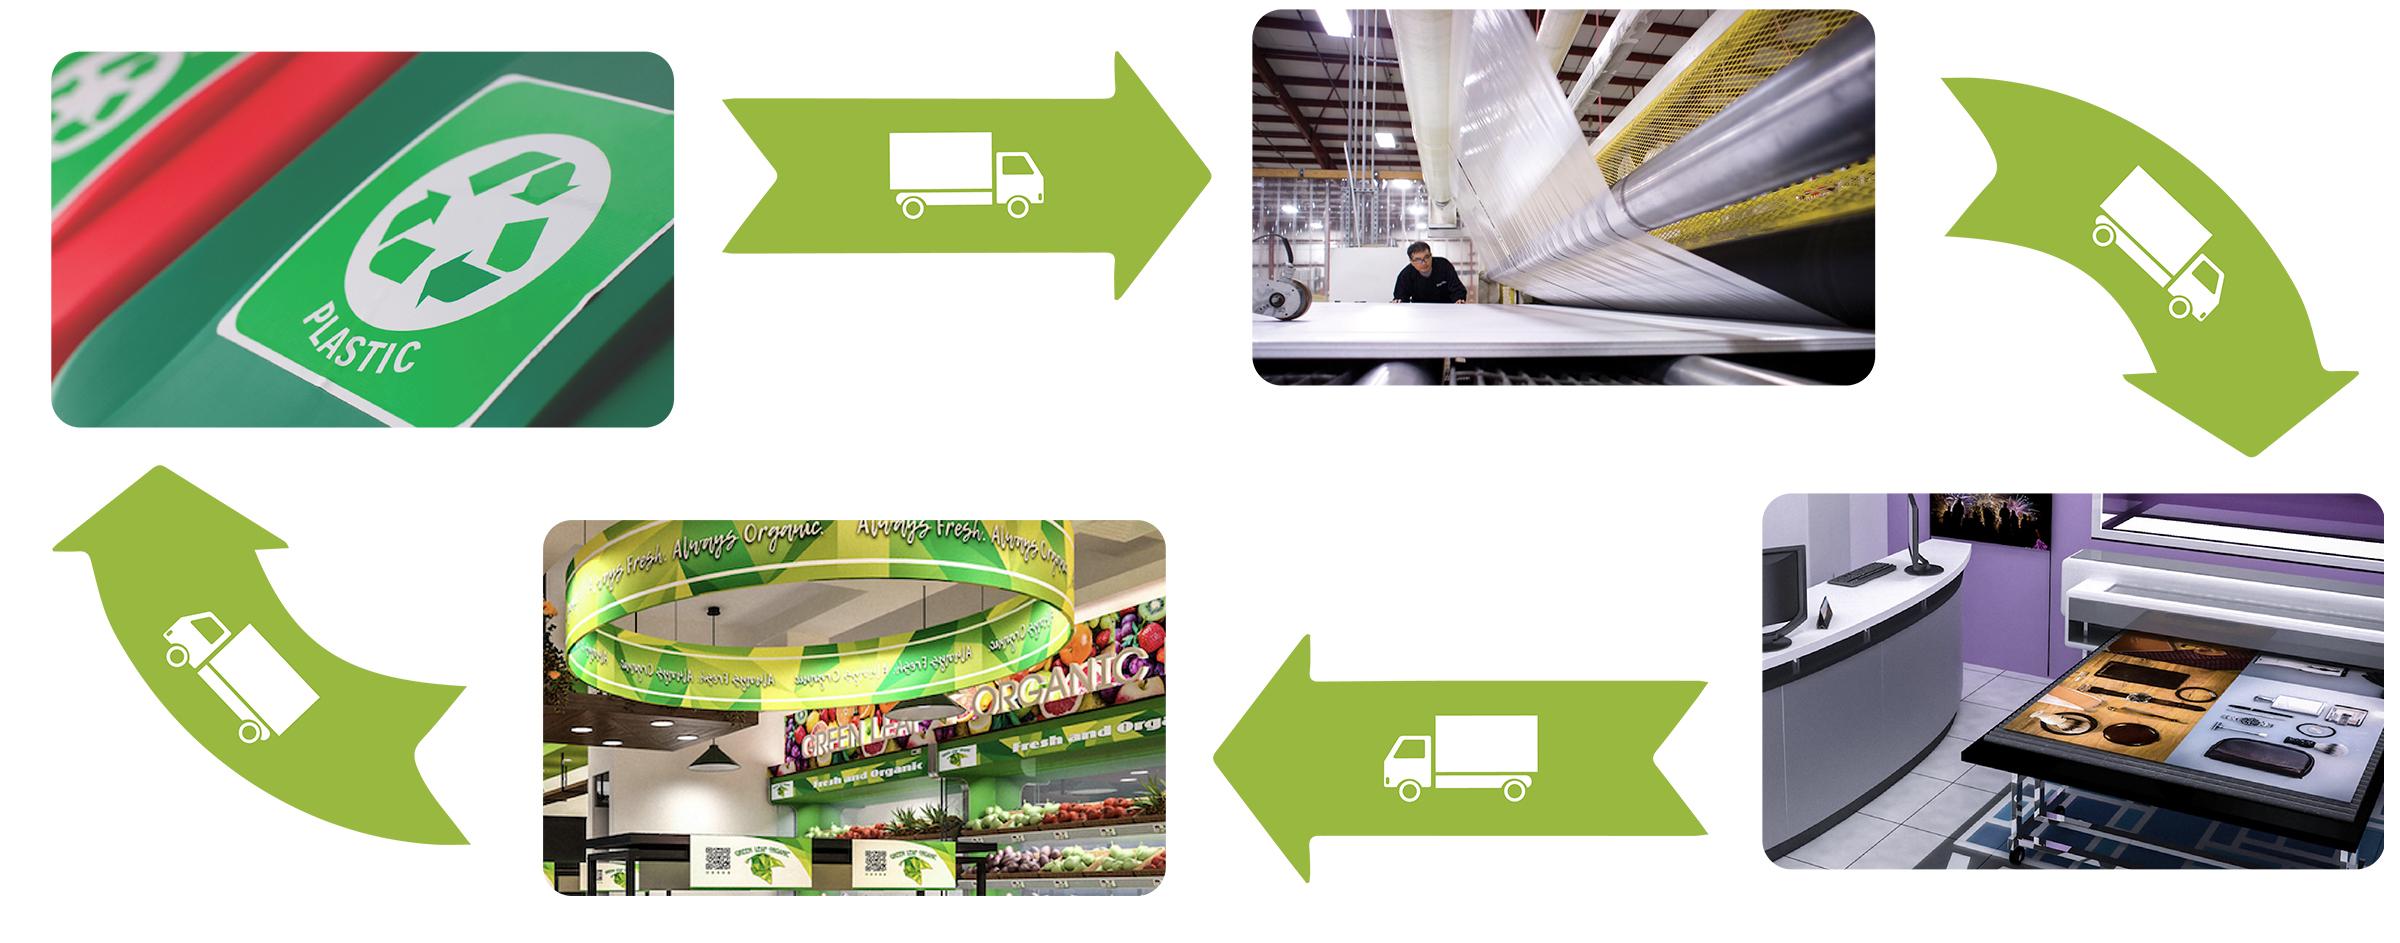 Vycom sustainability loop 8x3